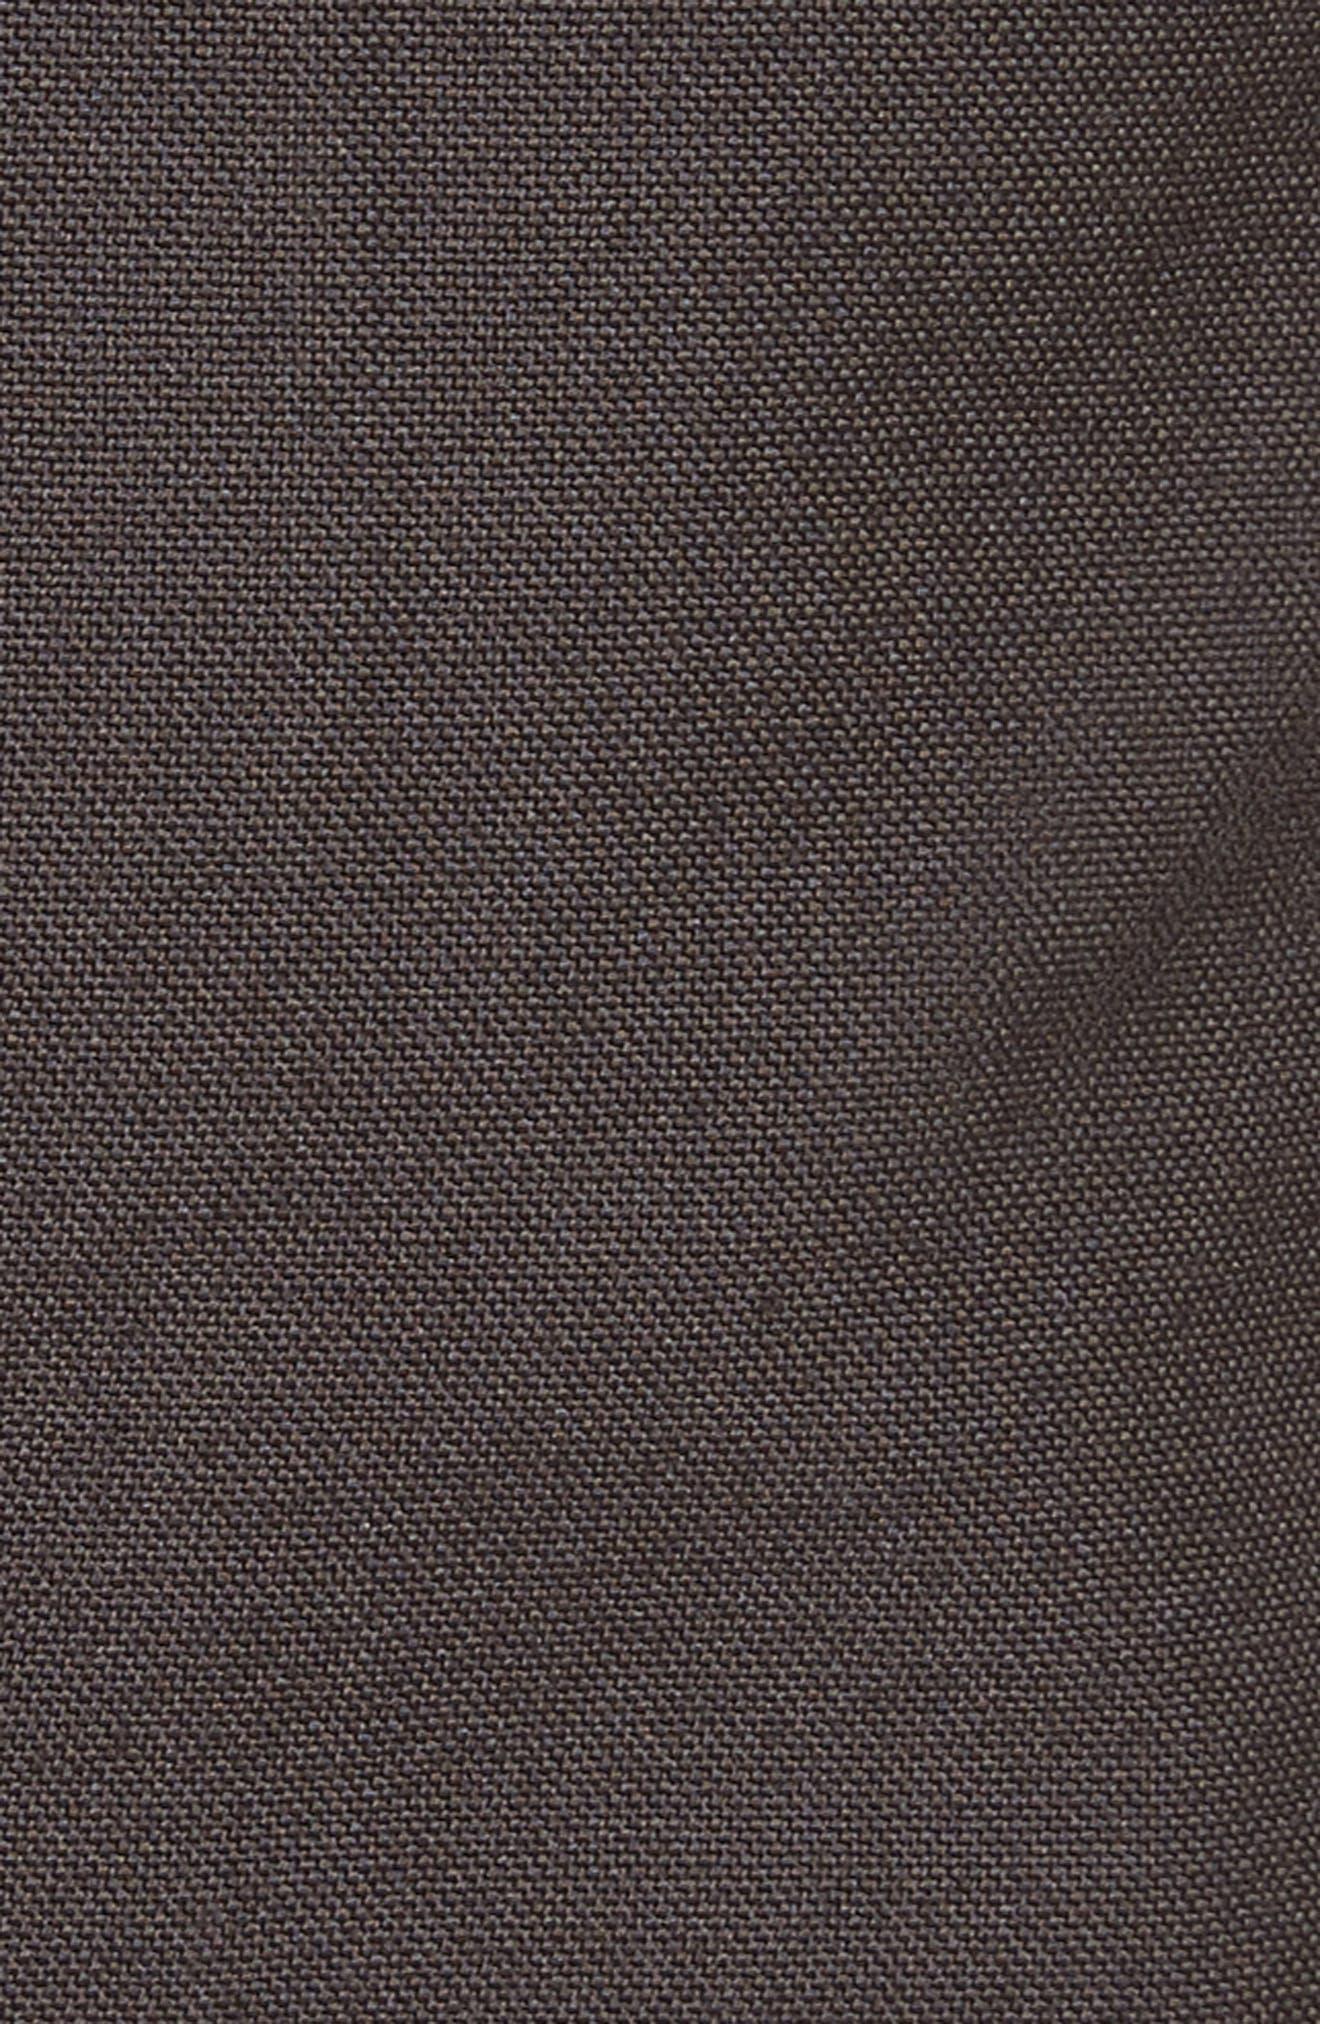 Cropped Drawstring Cargo Pants,                             Alternate thumbnail 5, color,                             004